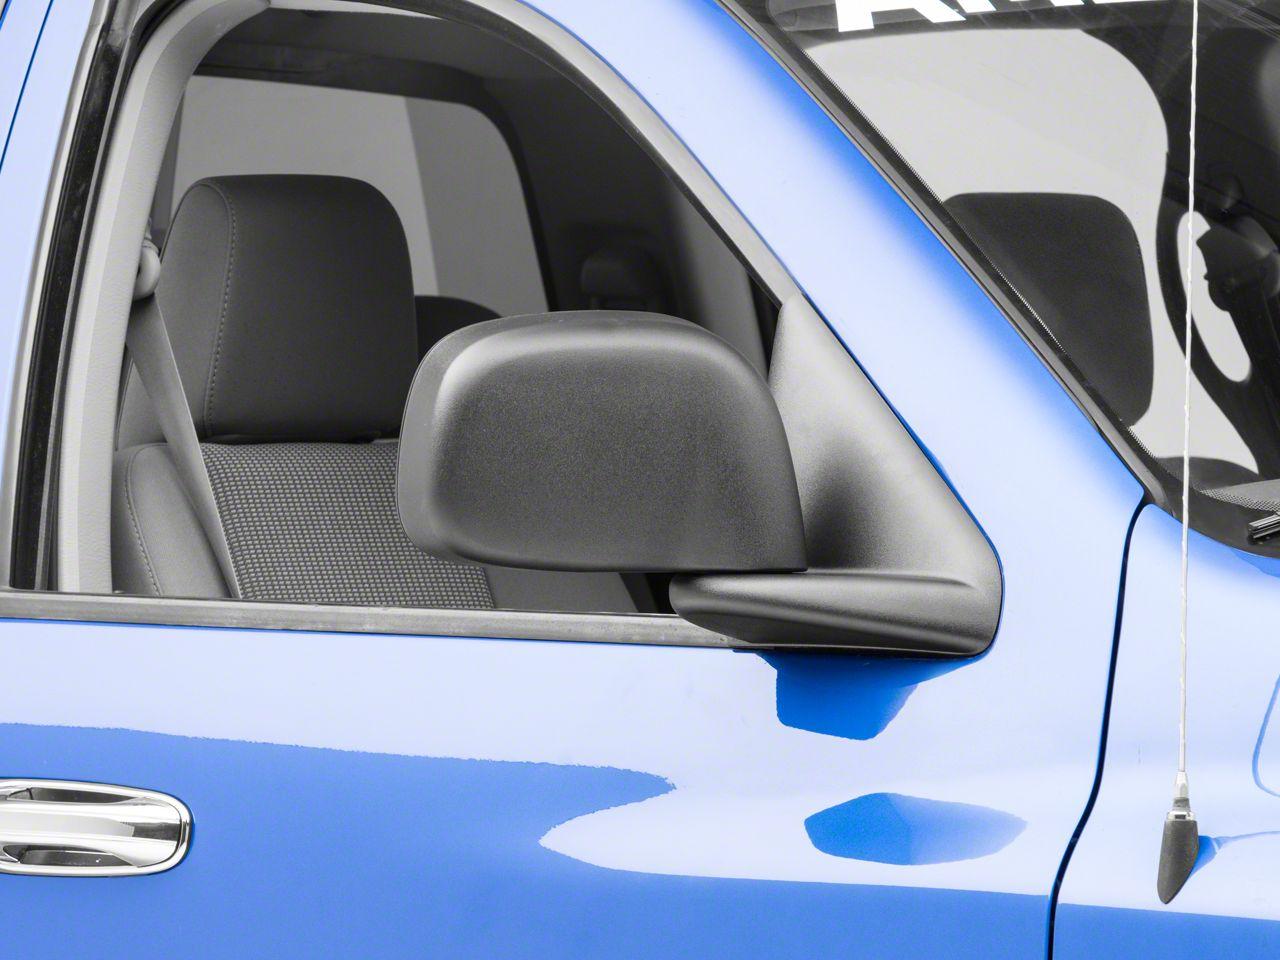 OPR Powered Heated Foldaway Mirror - Textured Black (06-08 RAM 1500)